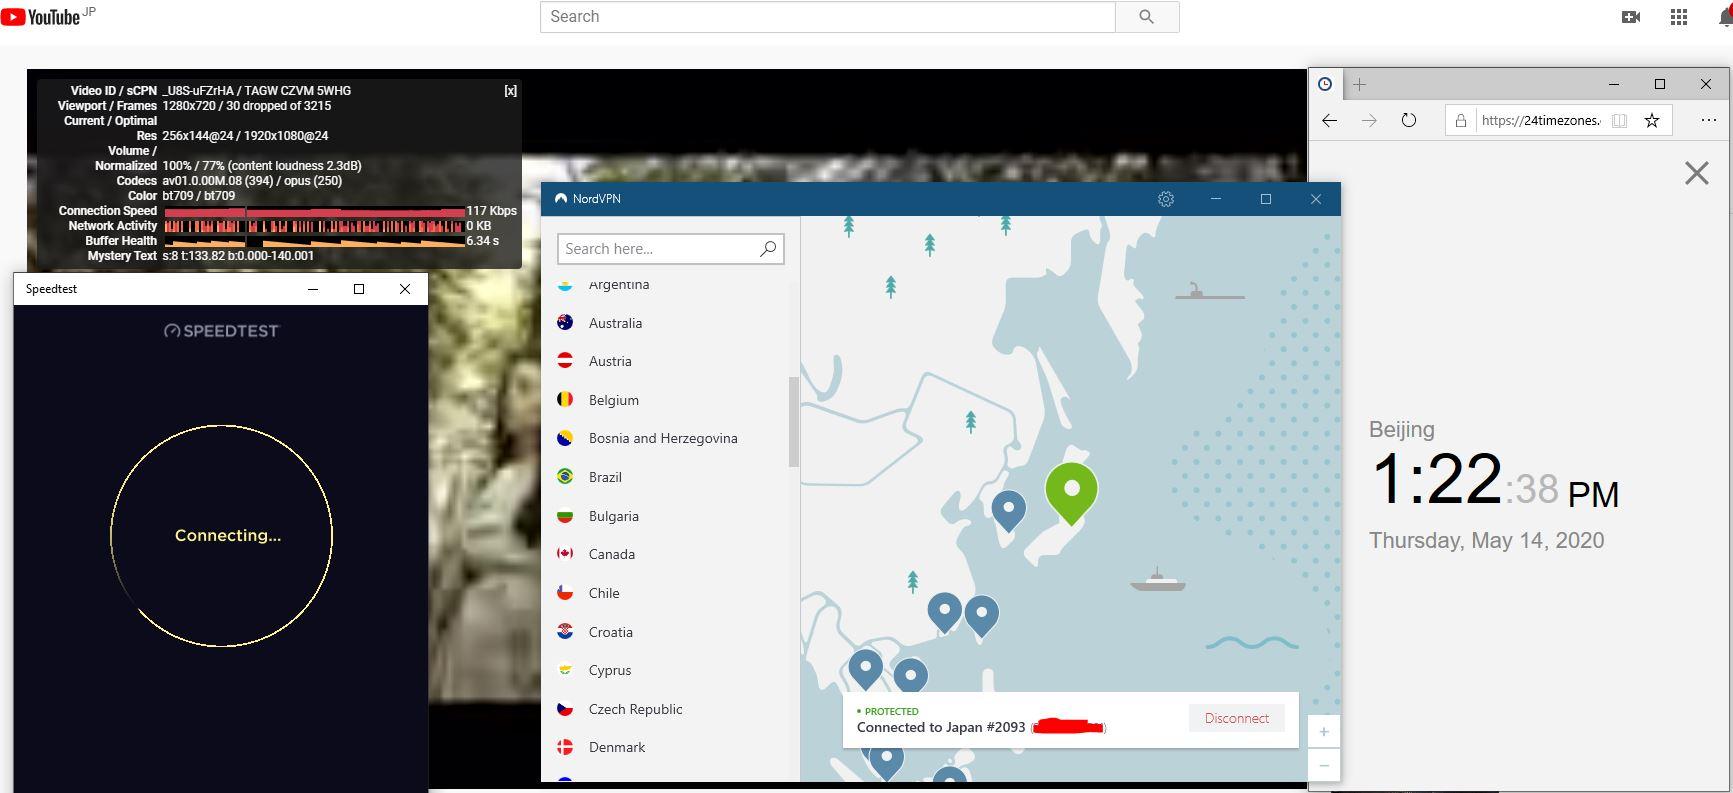 Windows10 NordVPN NordLynx-混淆关闭 Japan #2093 中国VPN 翻墙 科学上网 Speedtest+youtube测速-20200514